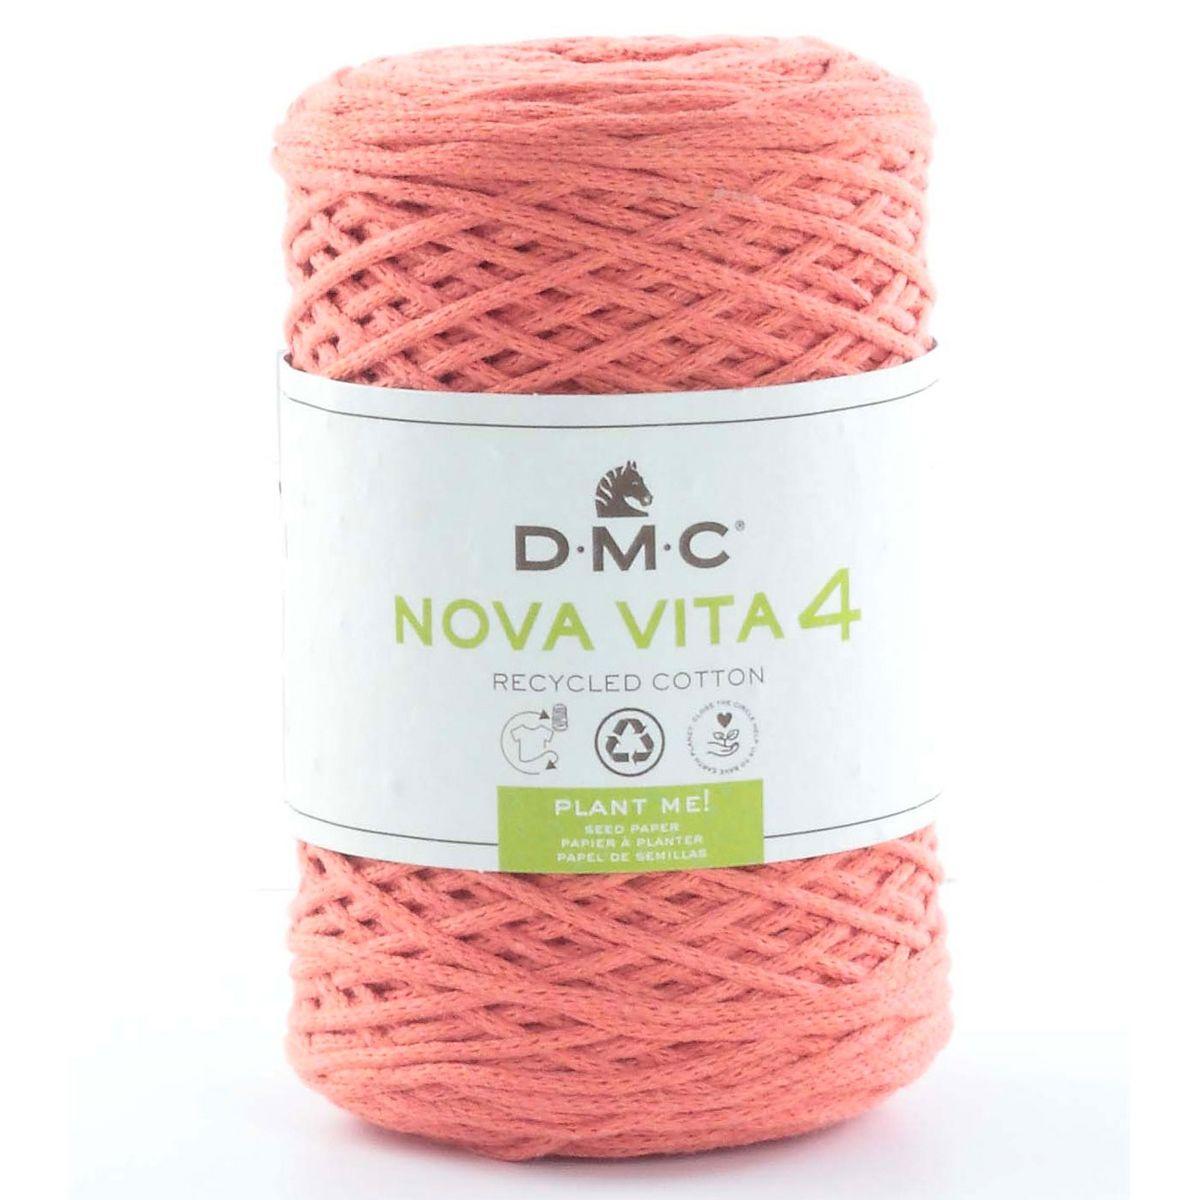 Coton recyclé Nova Vita 4 DMC